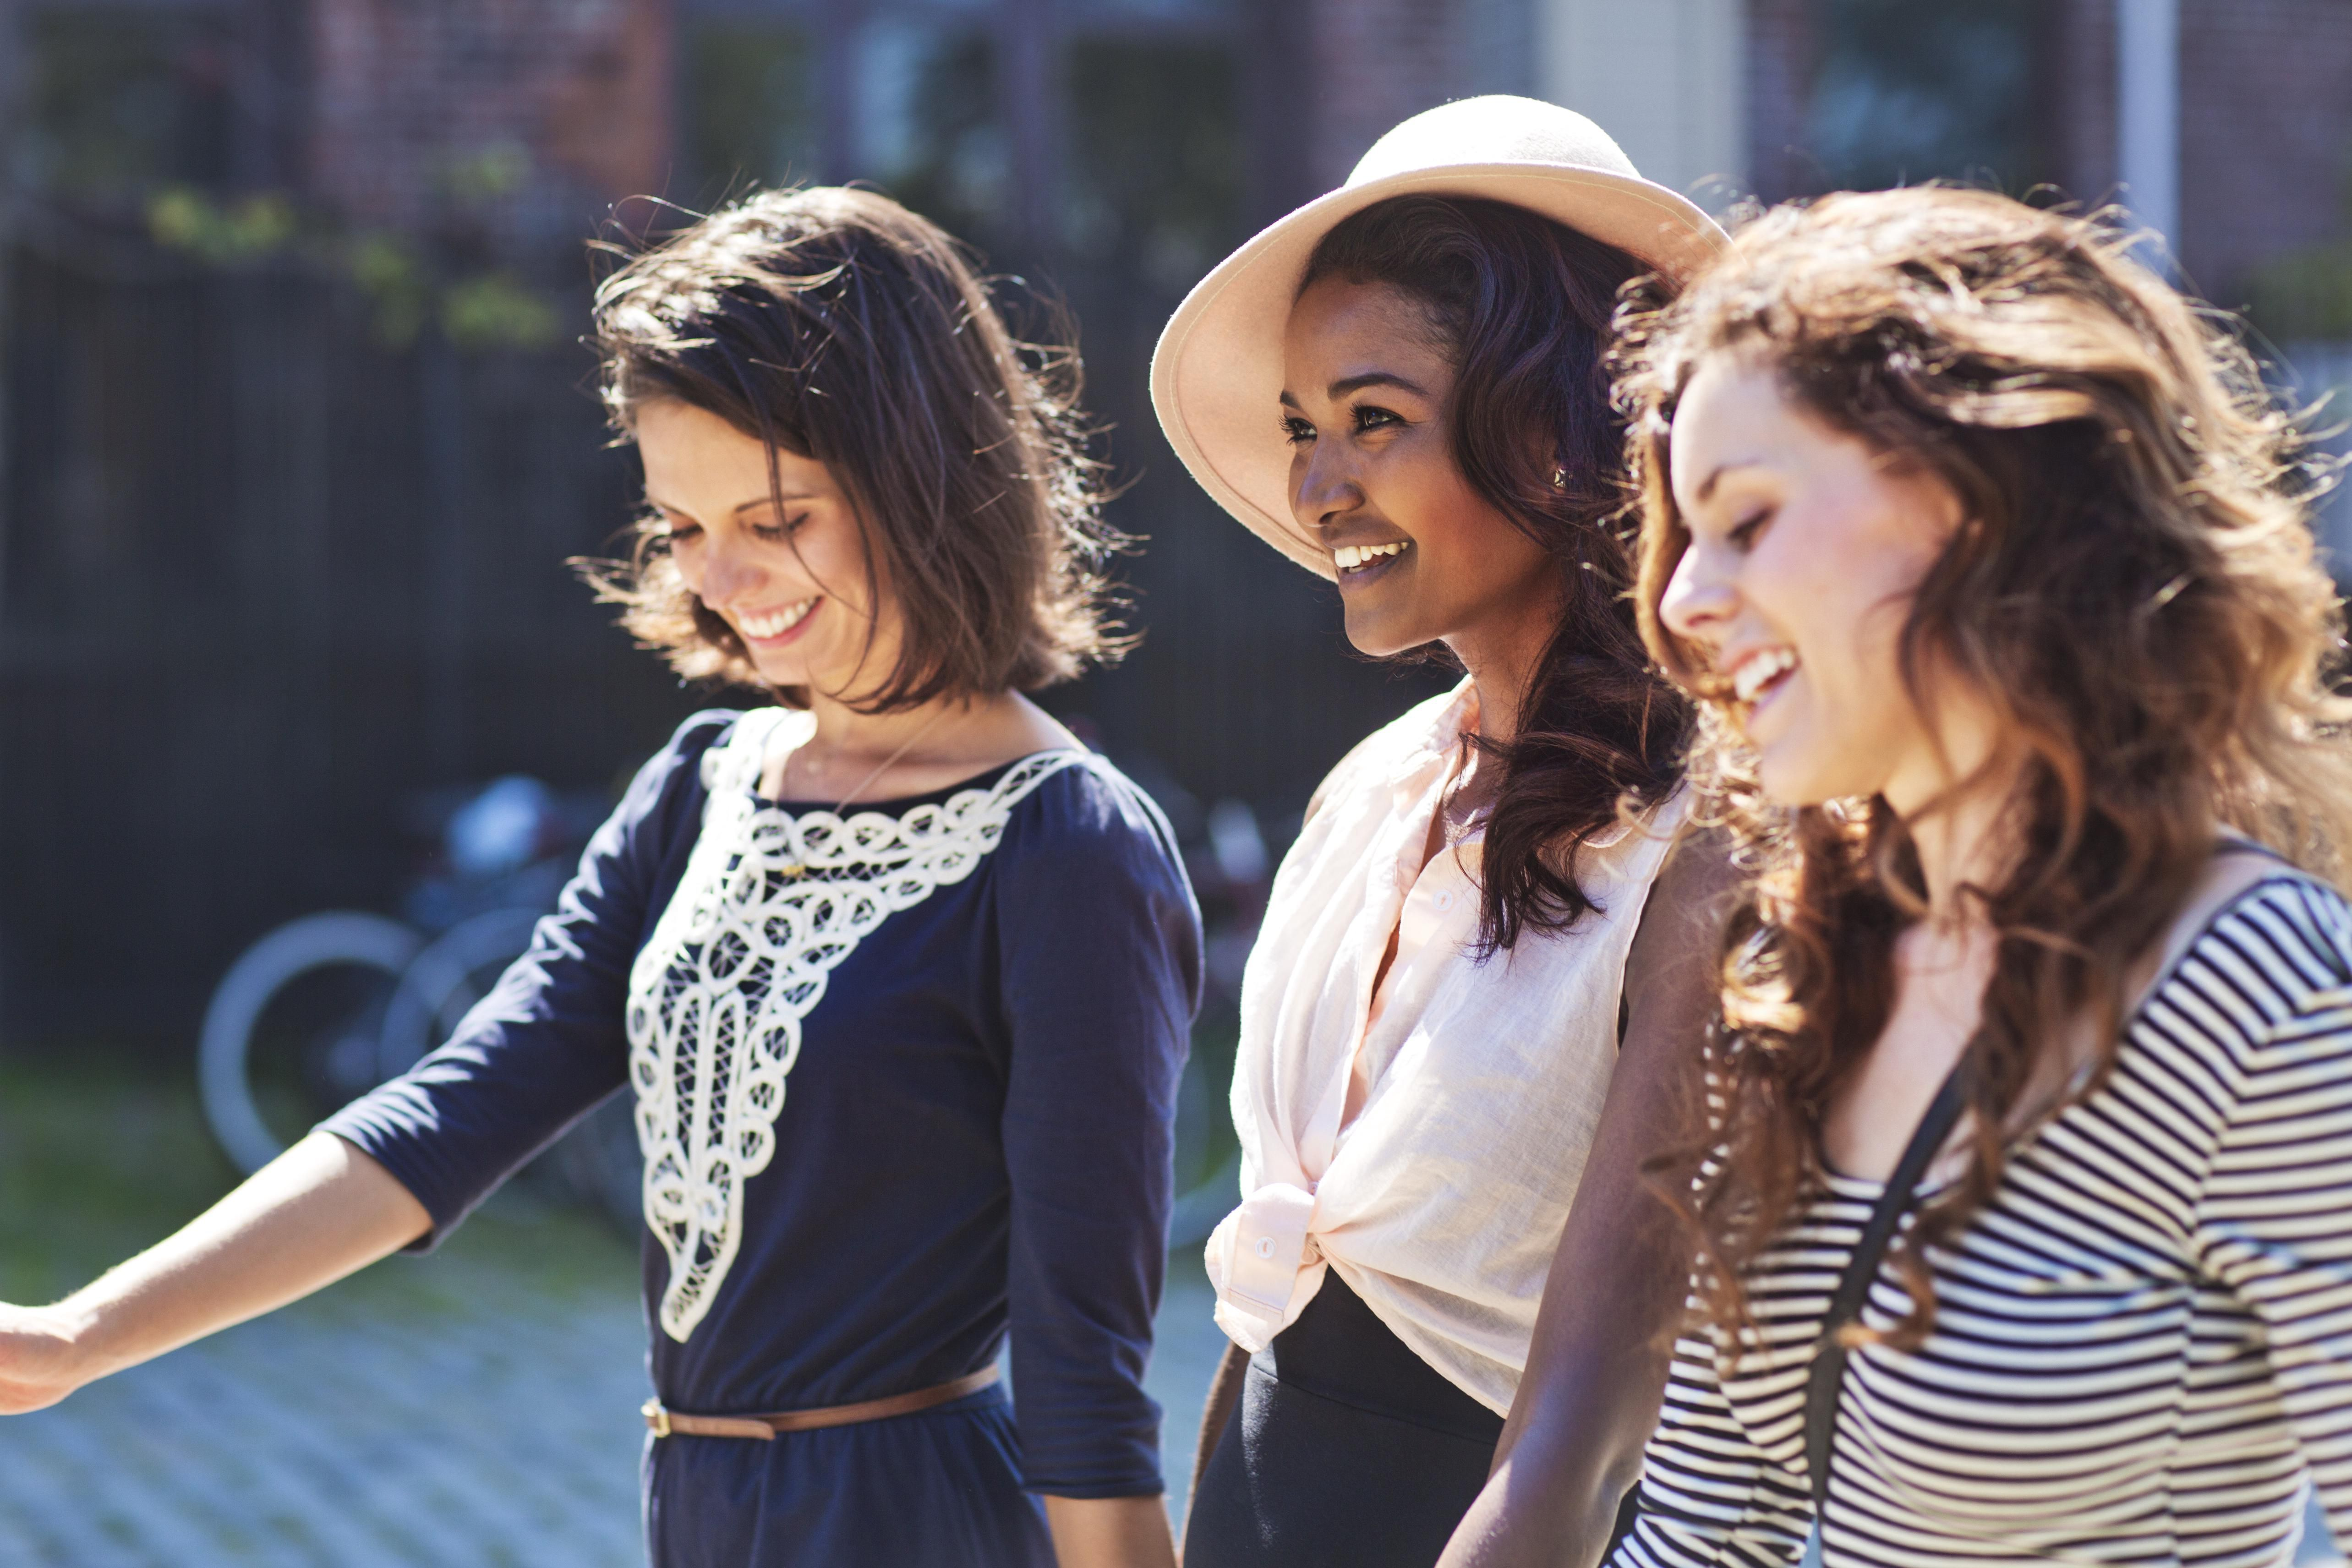 Establishing Personal Boundaries In A Friendship